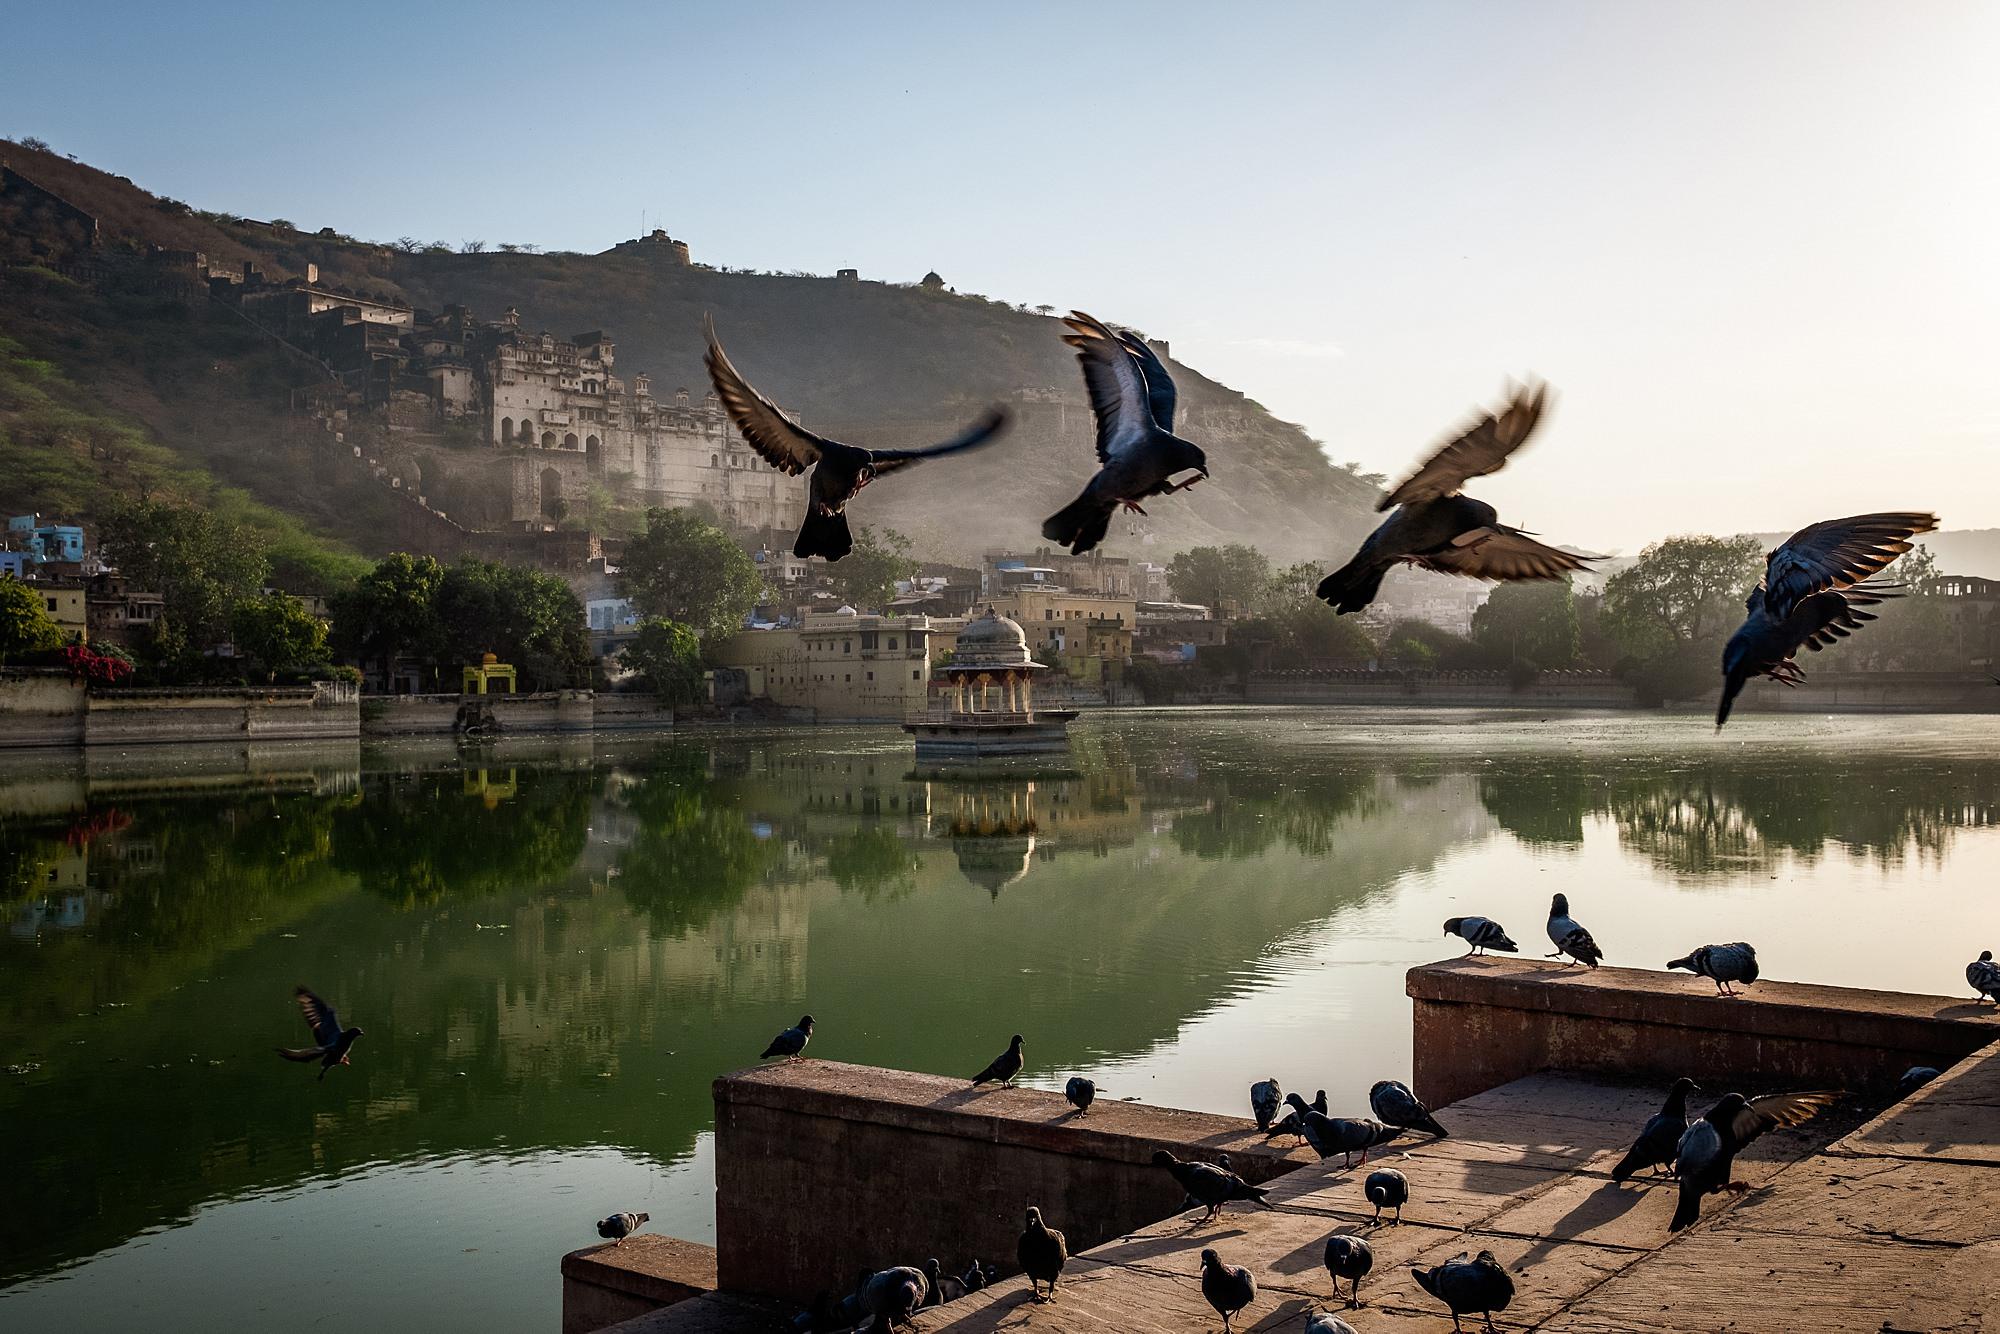 Bundi, India // 2019